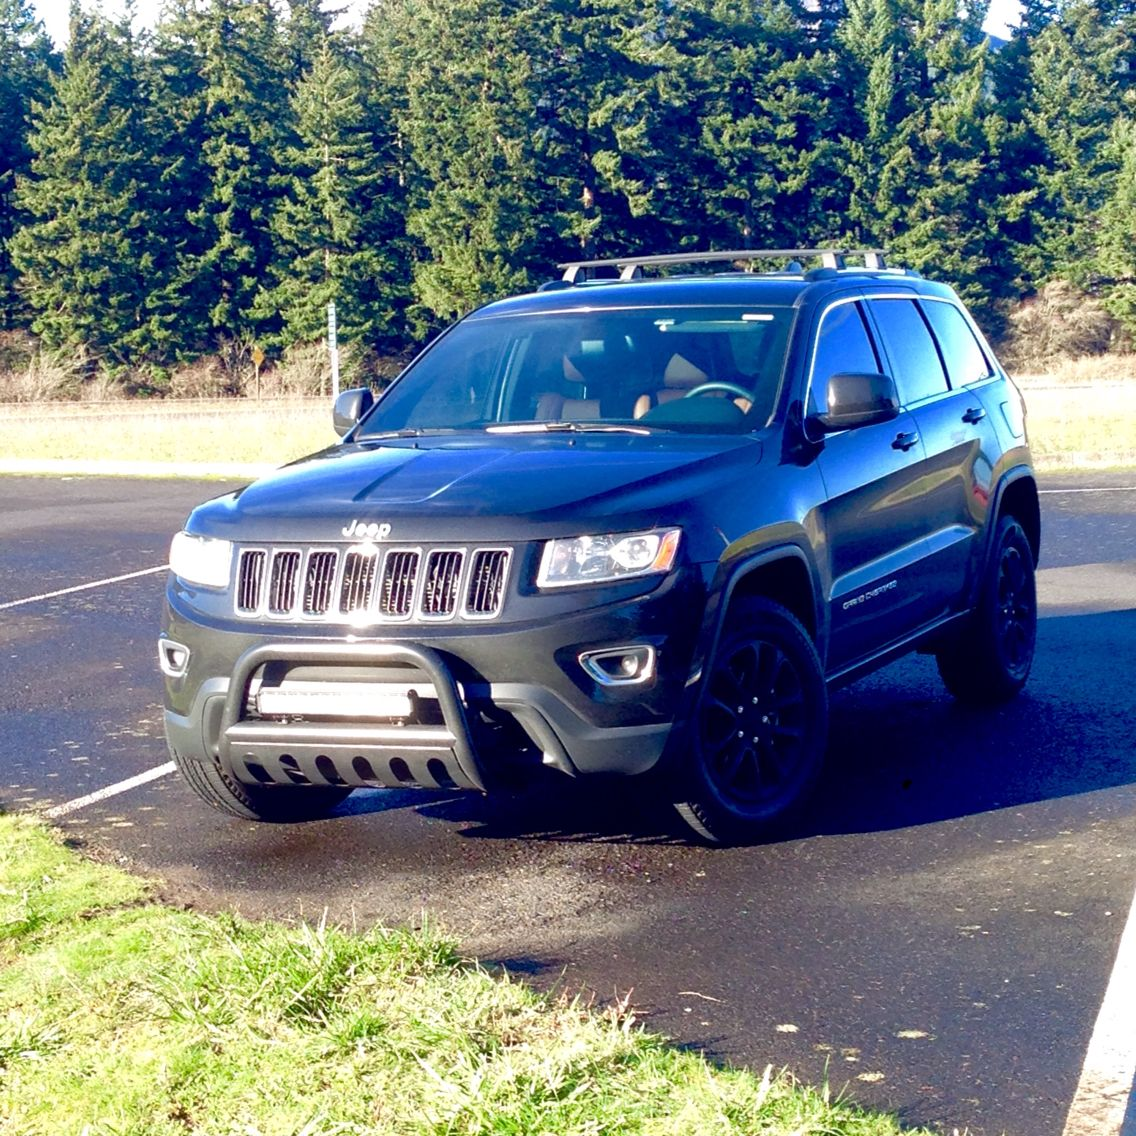 2014 jeep grand cherokee wk2 light bar bull bar brush guard plastidip black wheels [ 1136 x 1136 Pixel ]